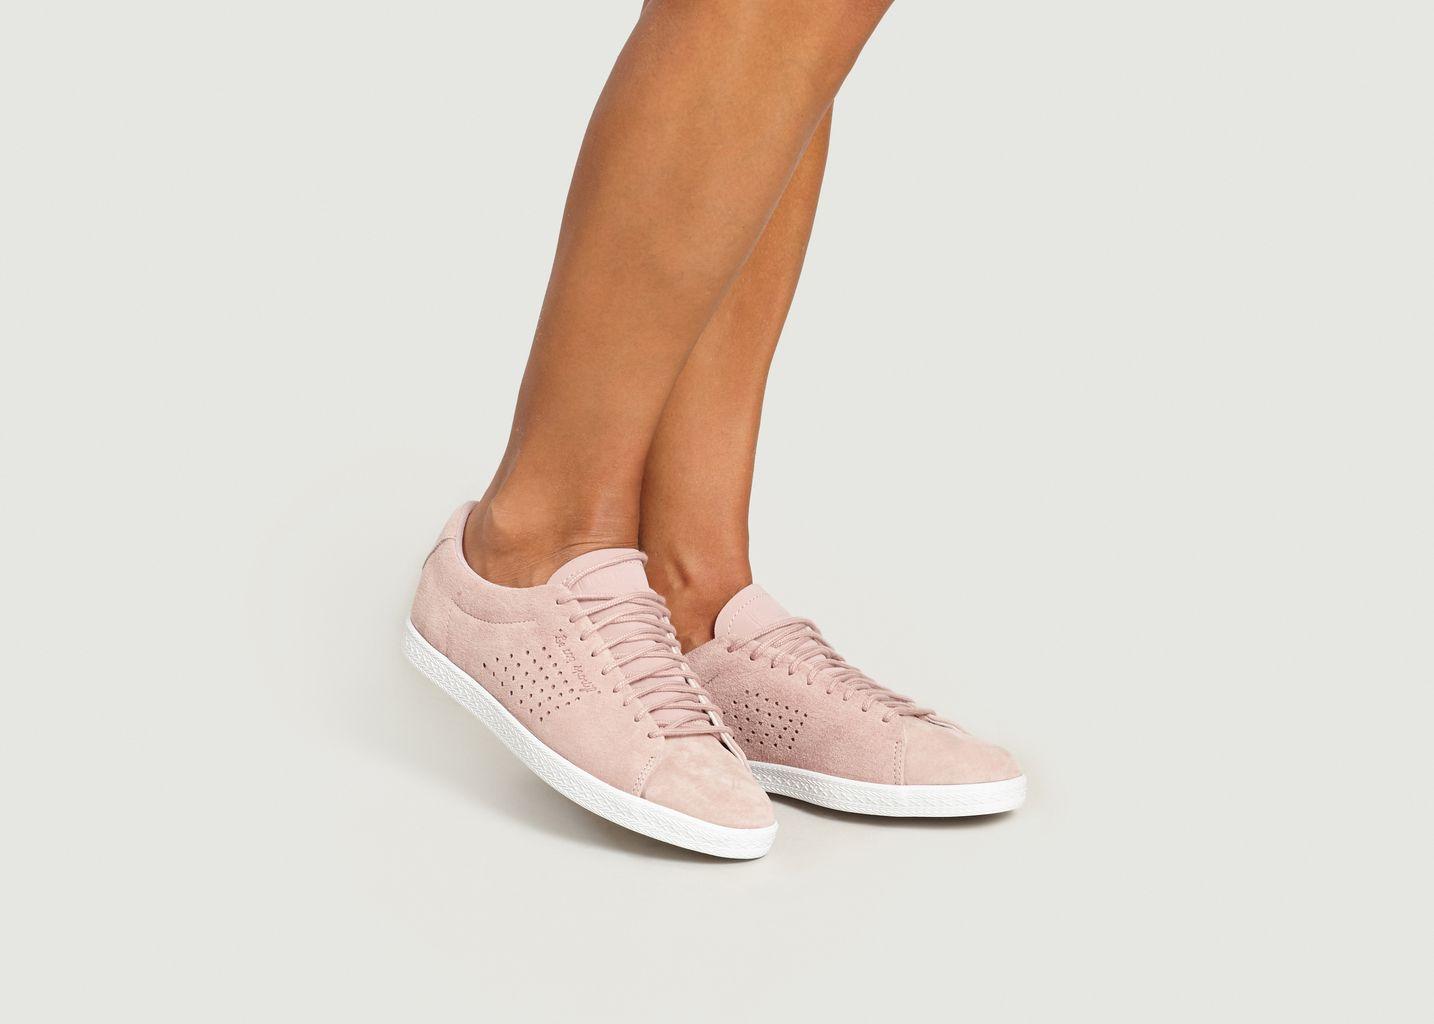 Sneakers Charline  - Le Coq Sportif